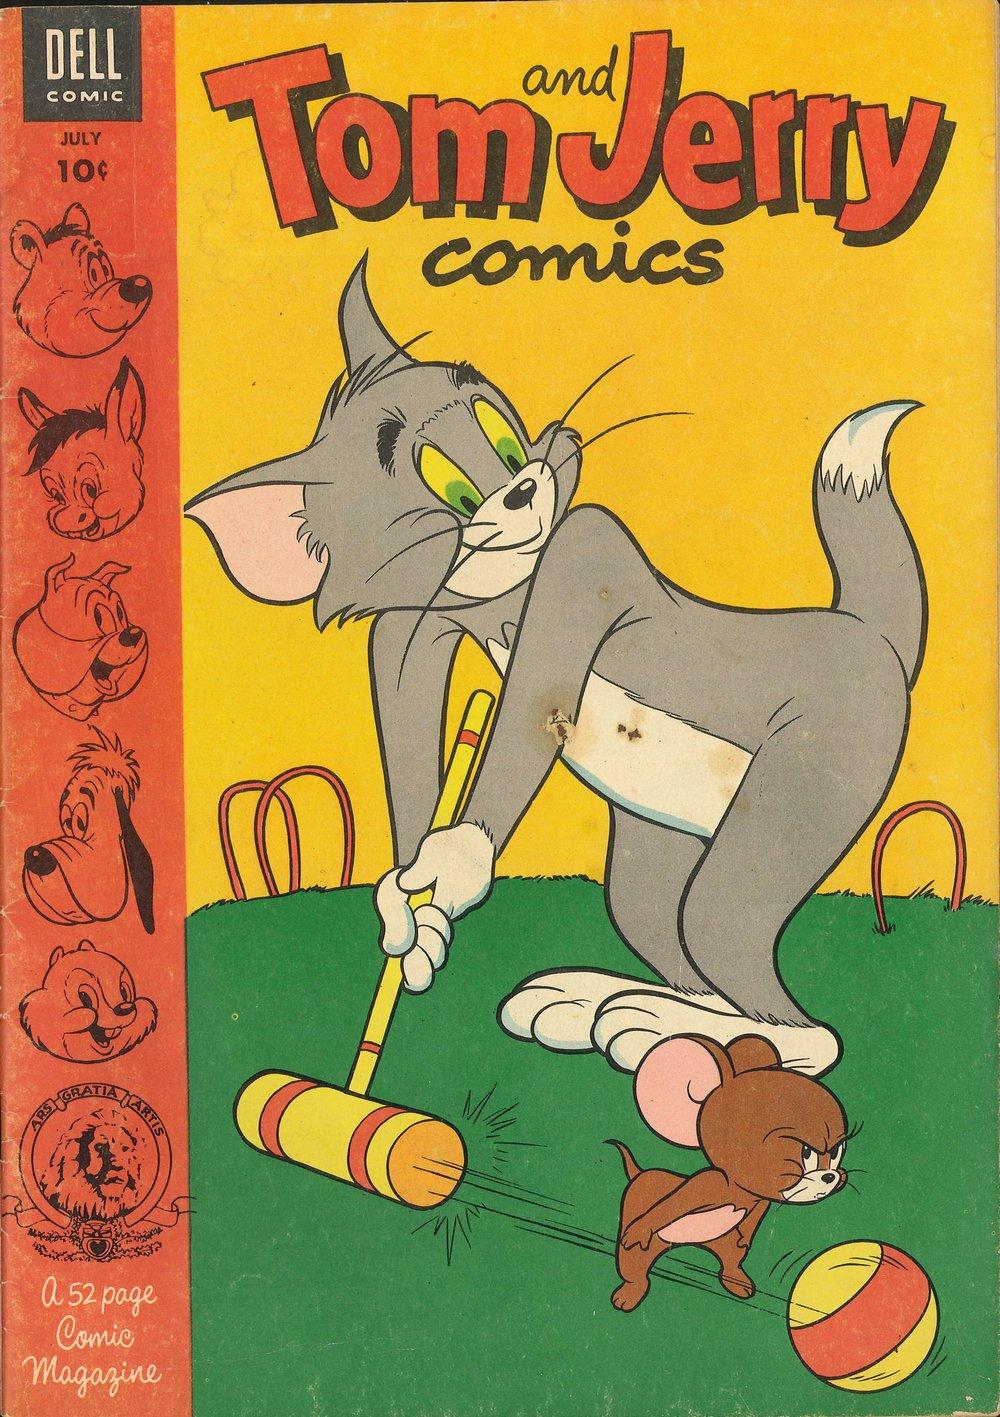 Tom & Jerry Comics 108 Page 1